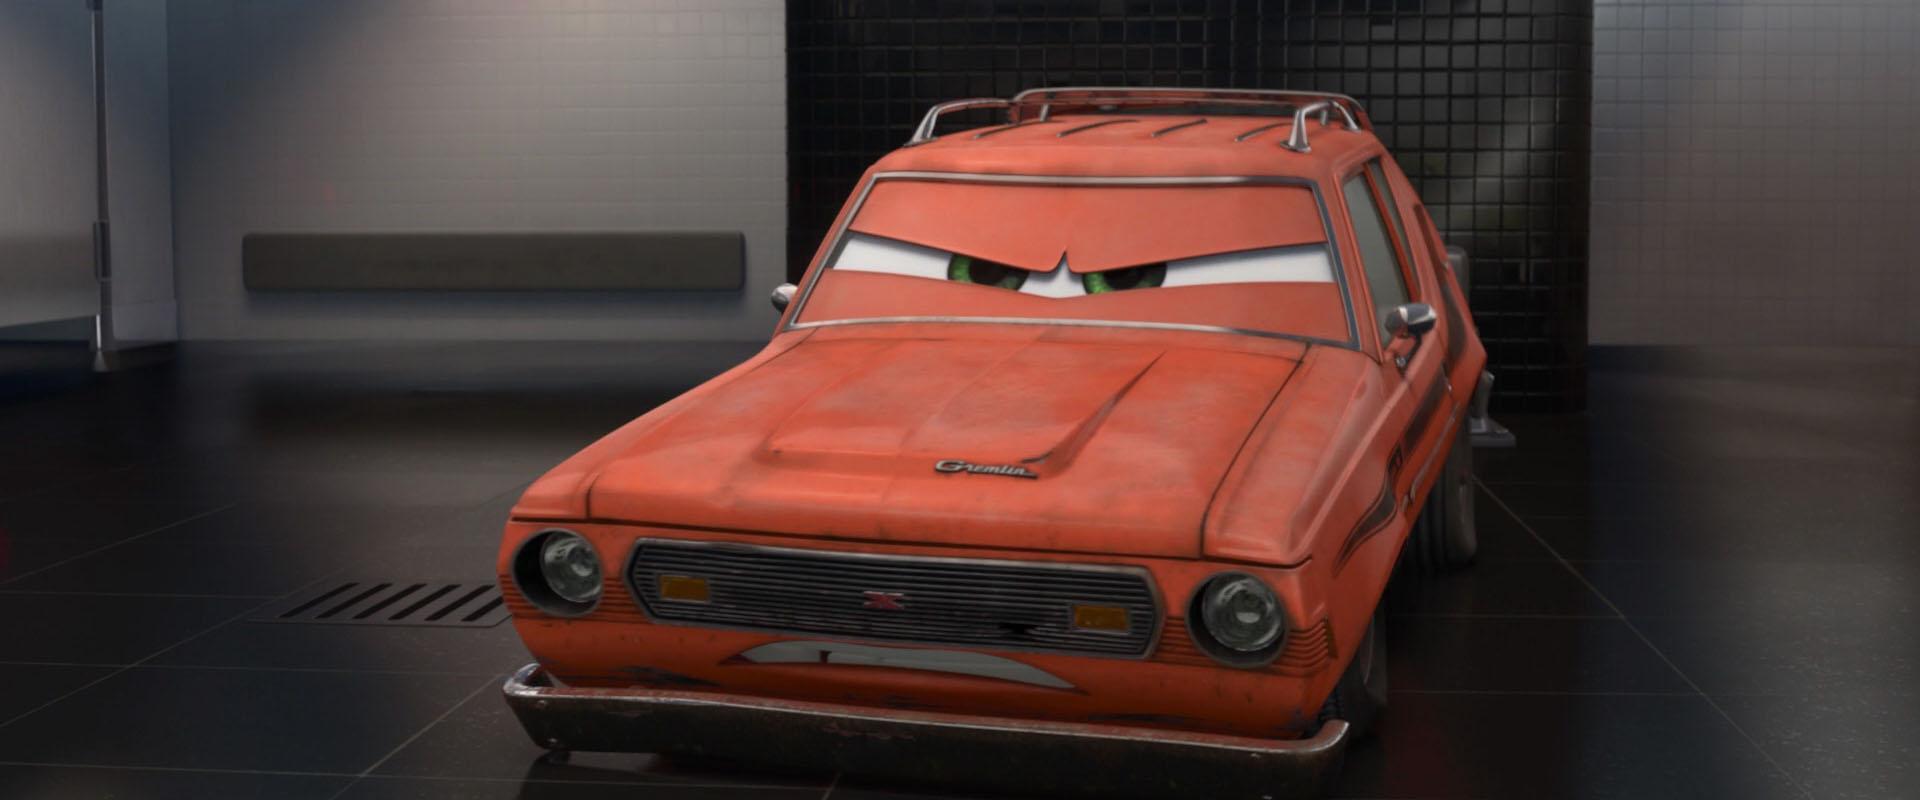 grem-personnage-cars-2-02